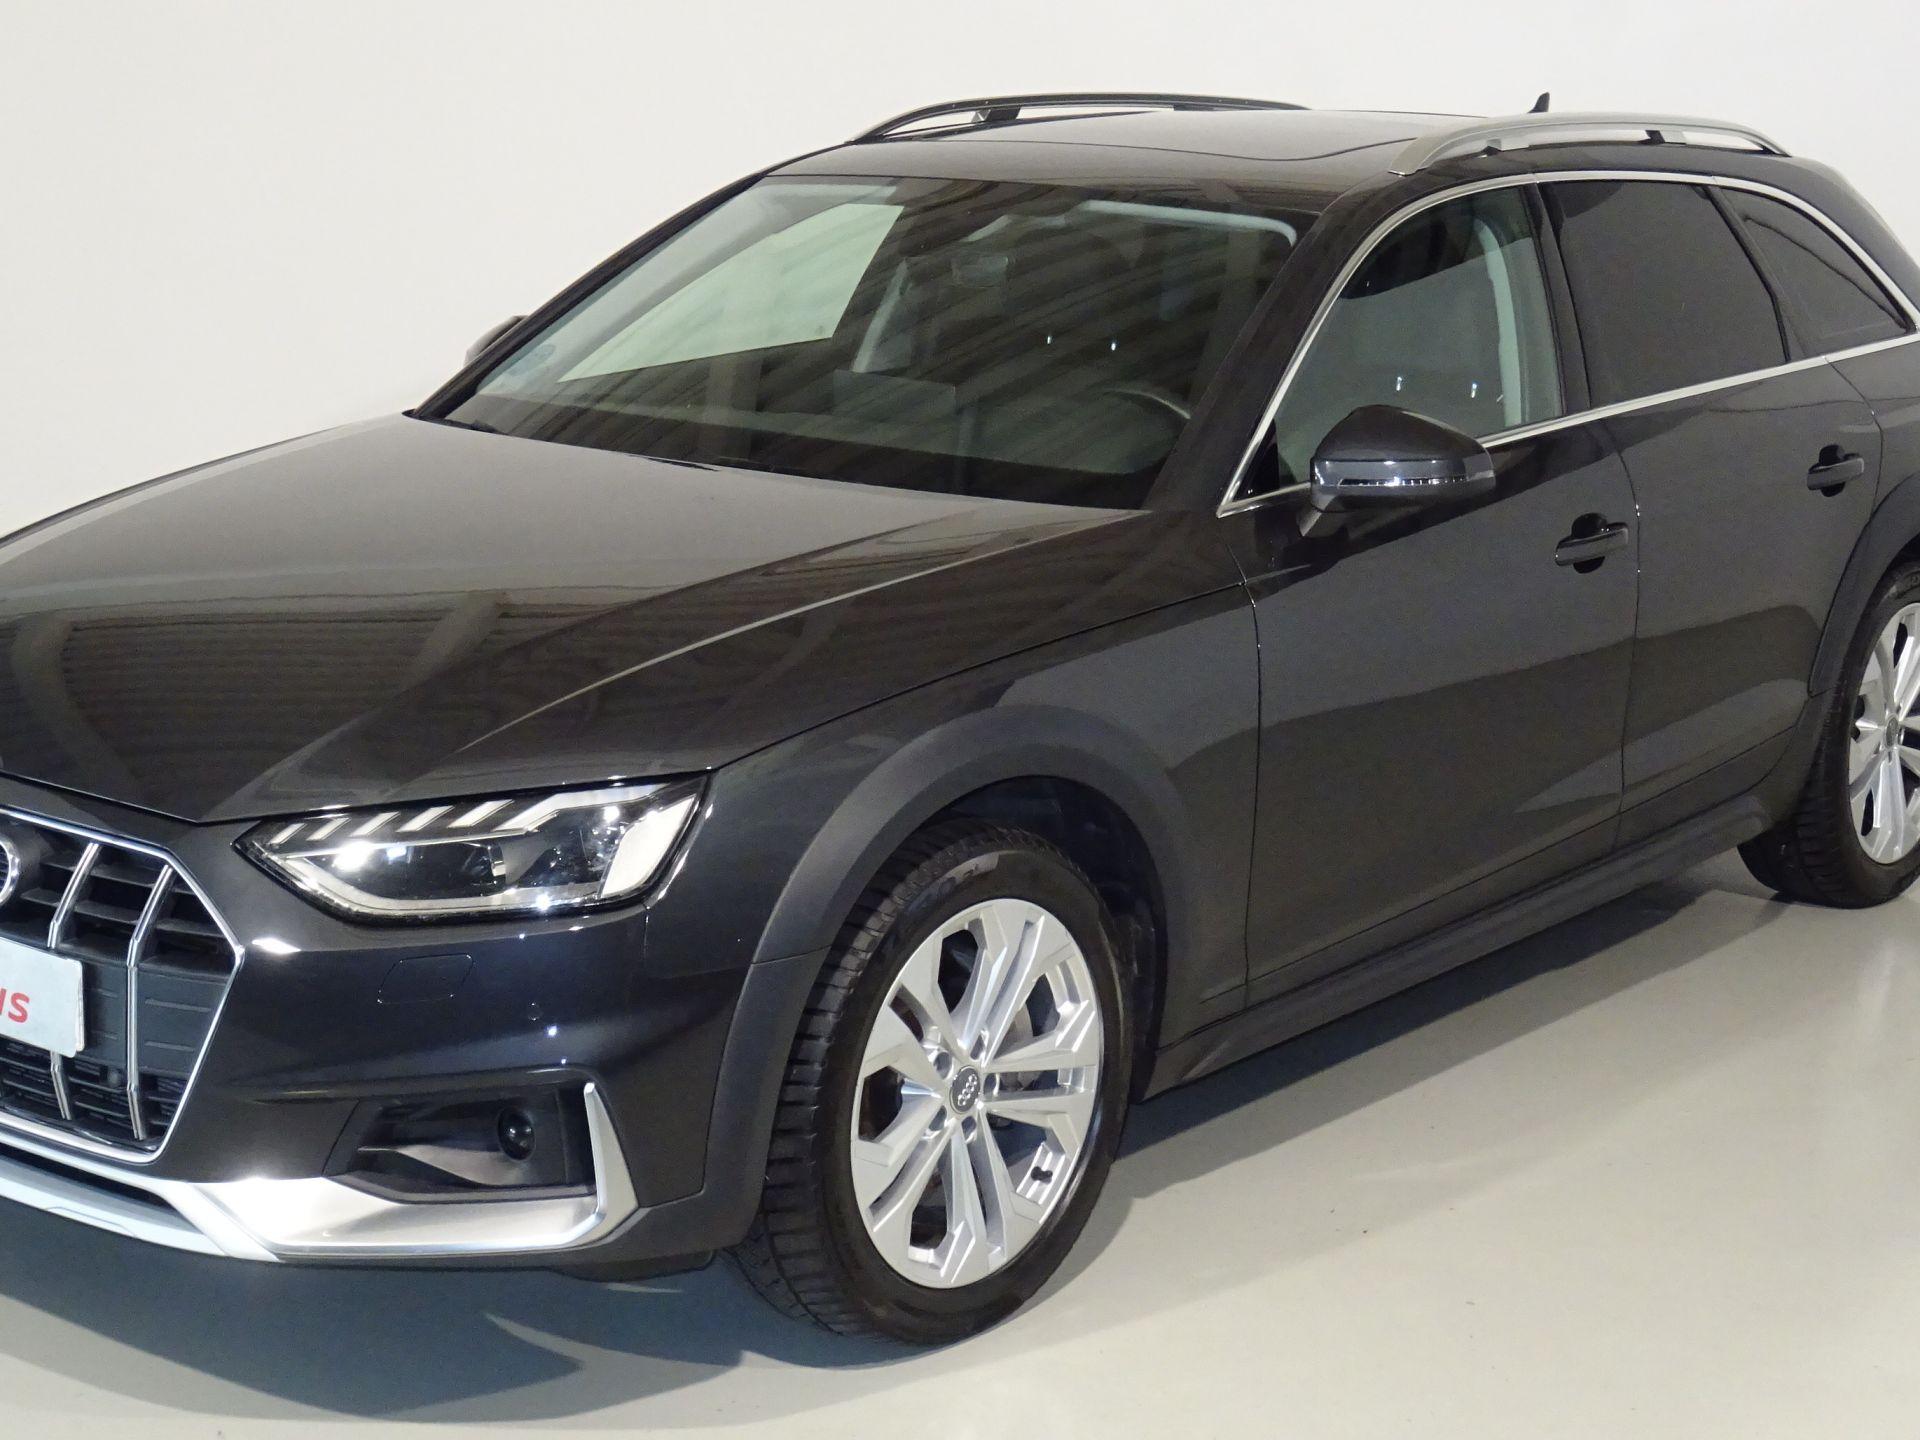 Audi A4 Allroad Quattro 40 TDI 140kW (190CV) quattro S tronic